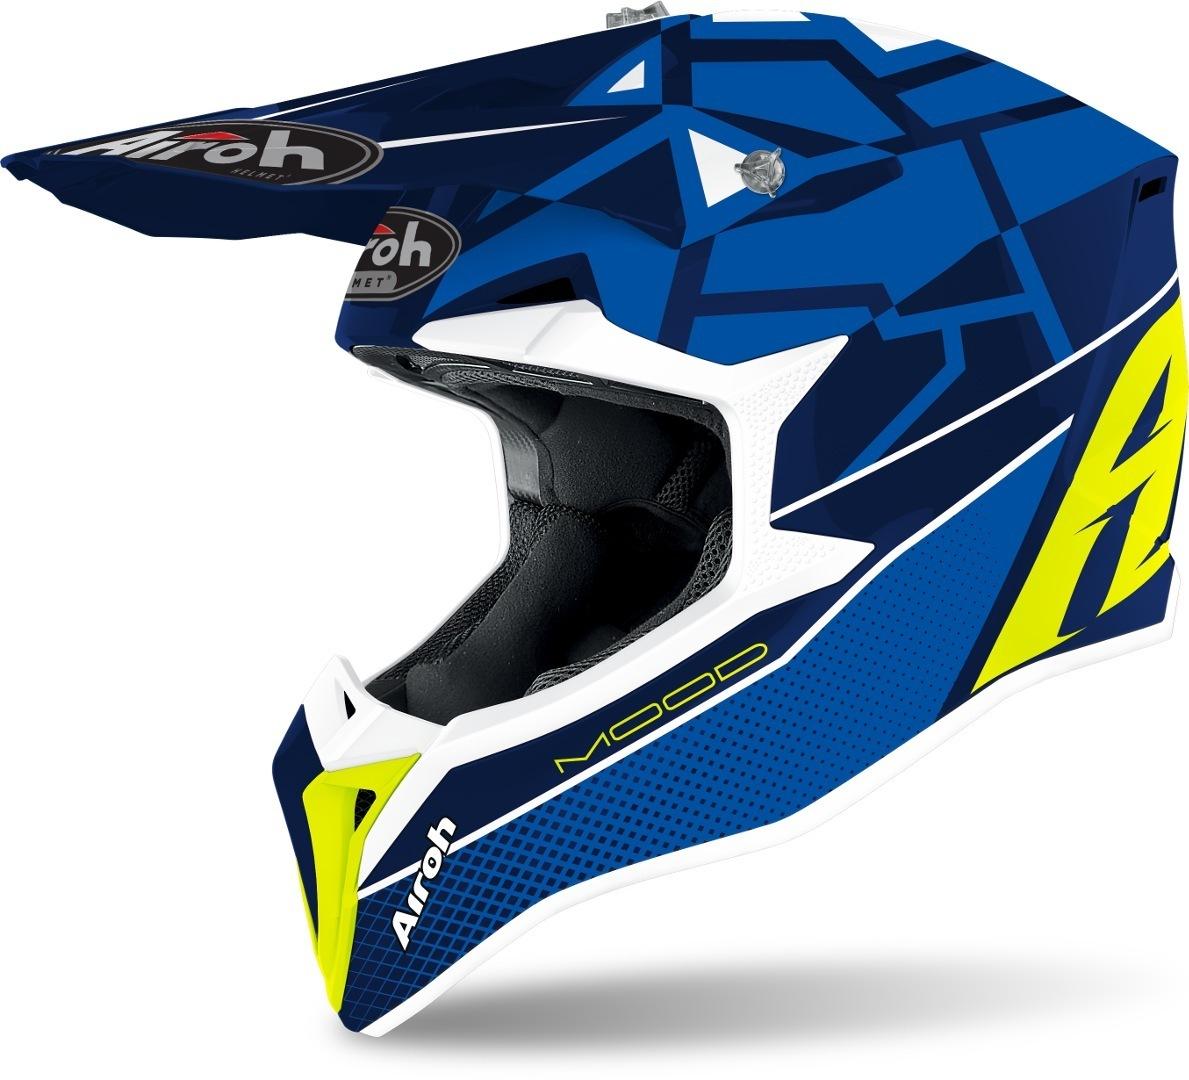 Airoh Wraap Mood Motocross Helm, blau, Größe XL, blau, Größe XL